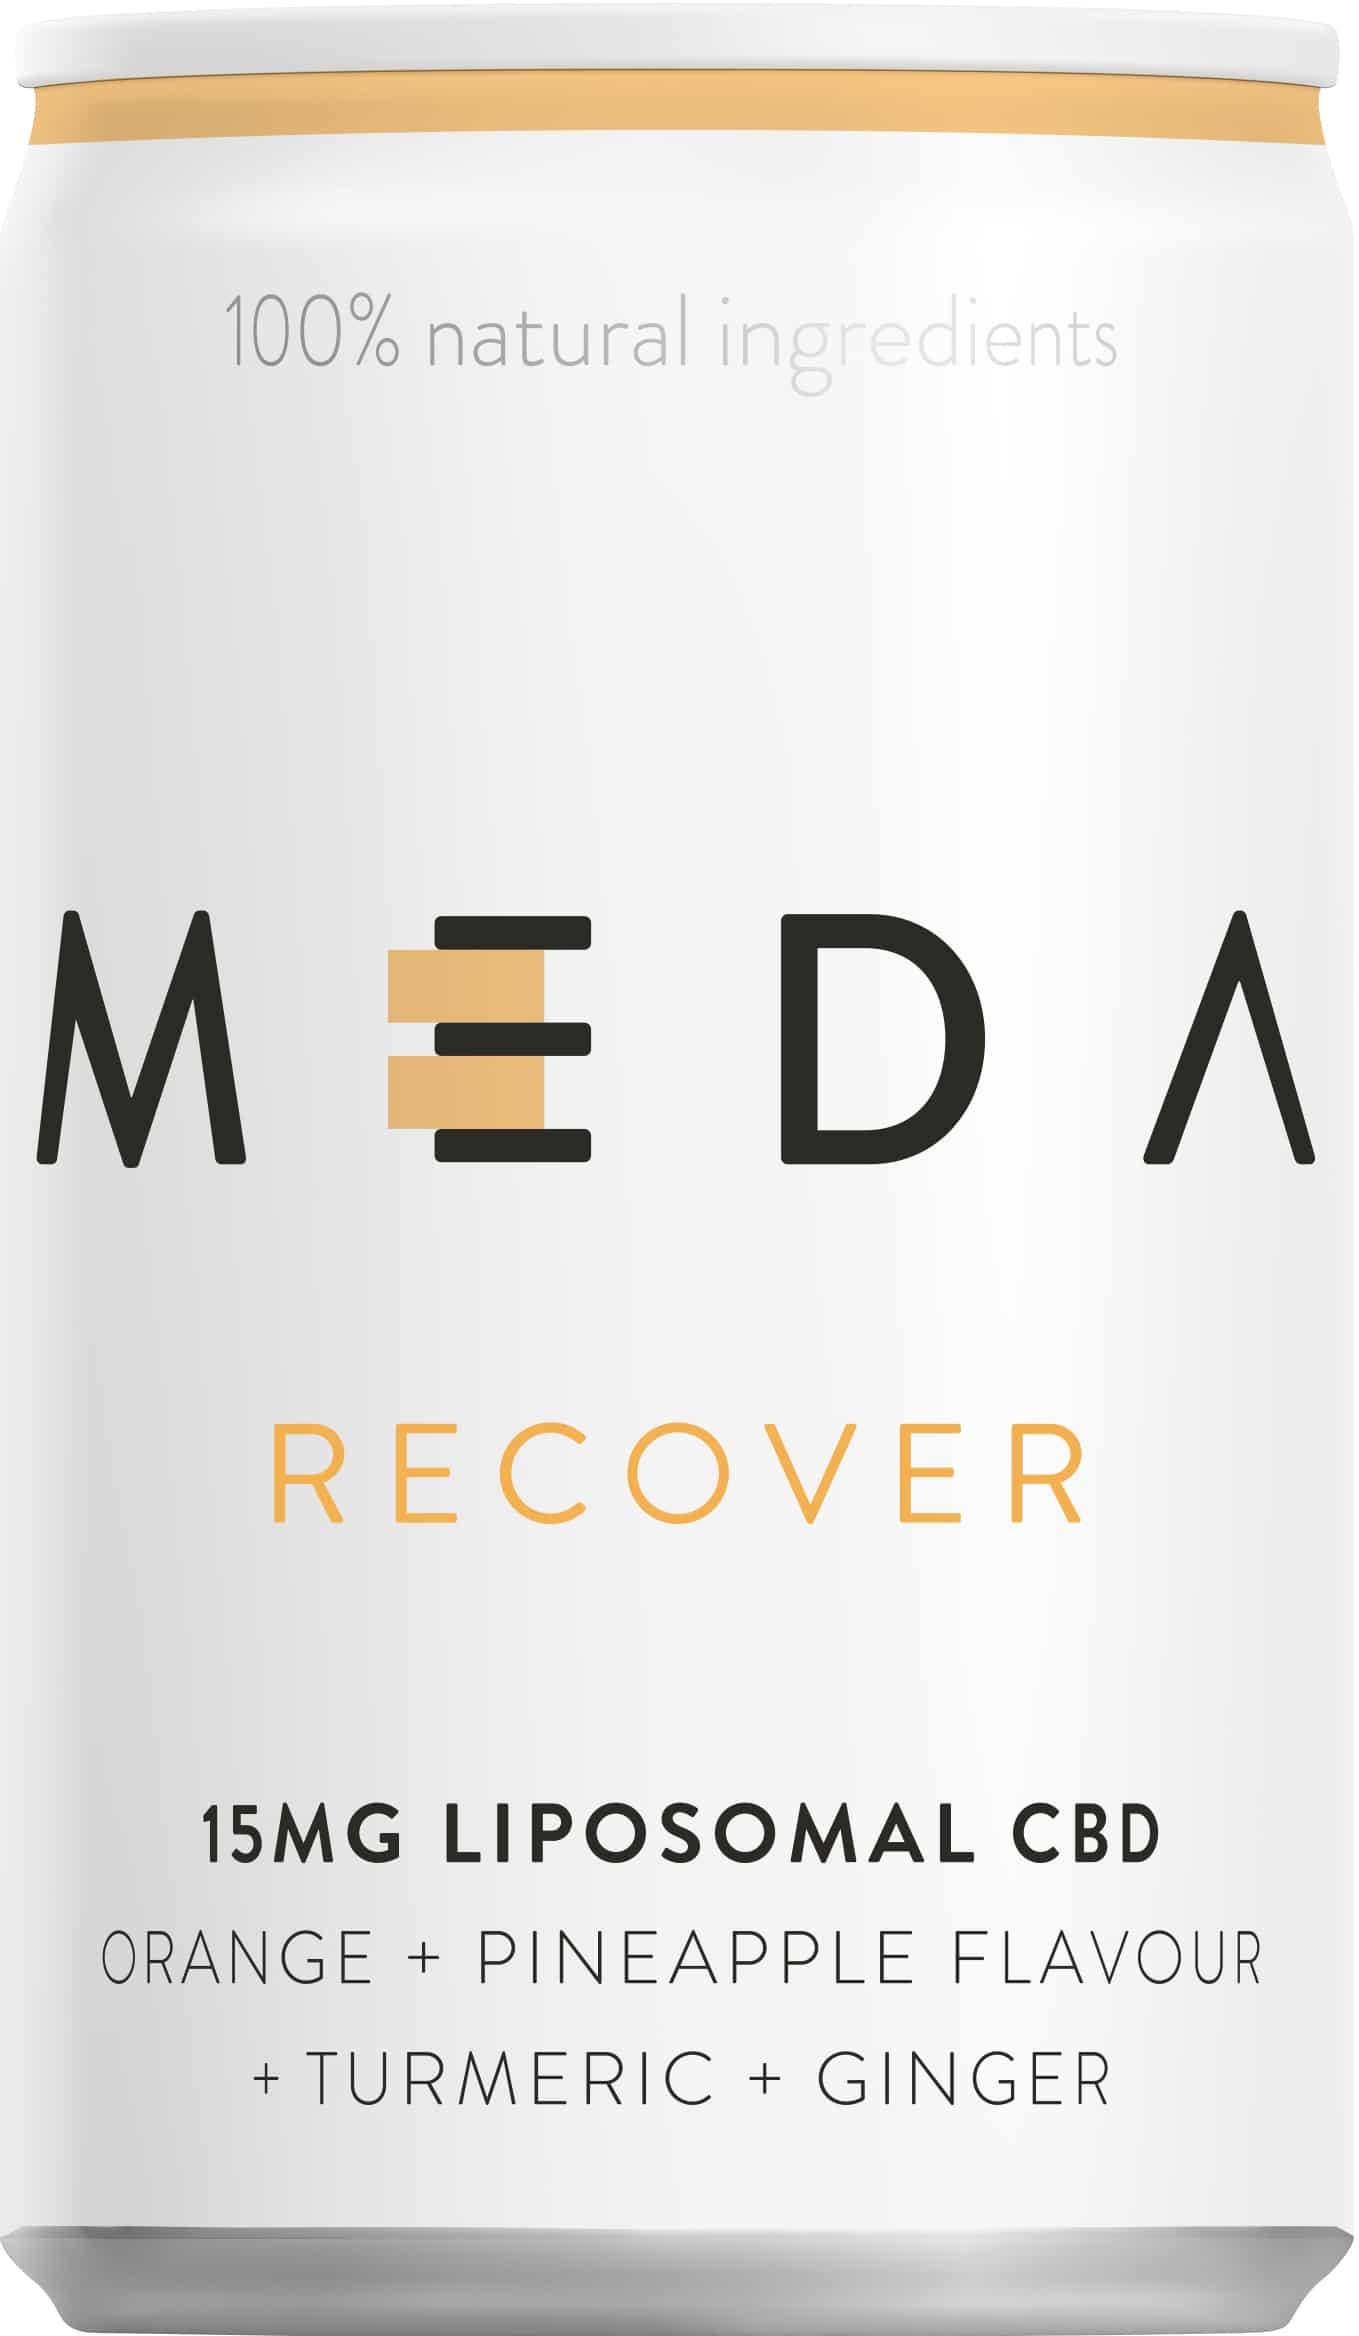 MEDA Recover CBD drink